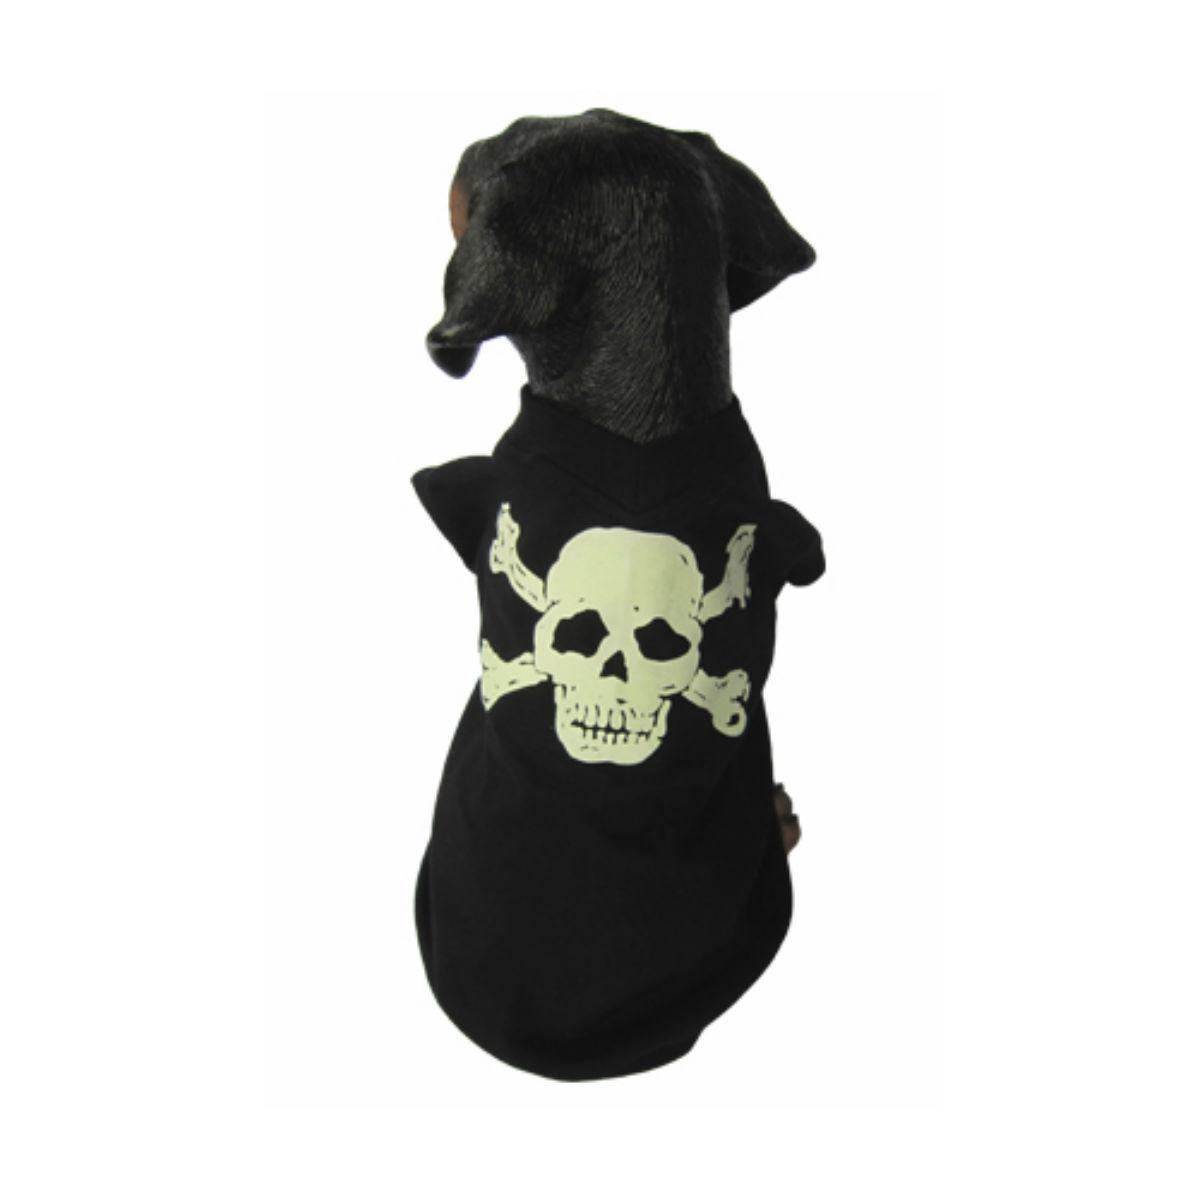 Puppe Love Glow in the Dark Skull Dog Shirt